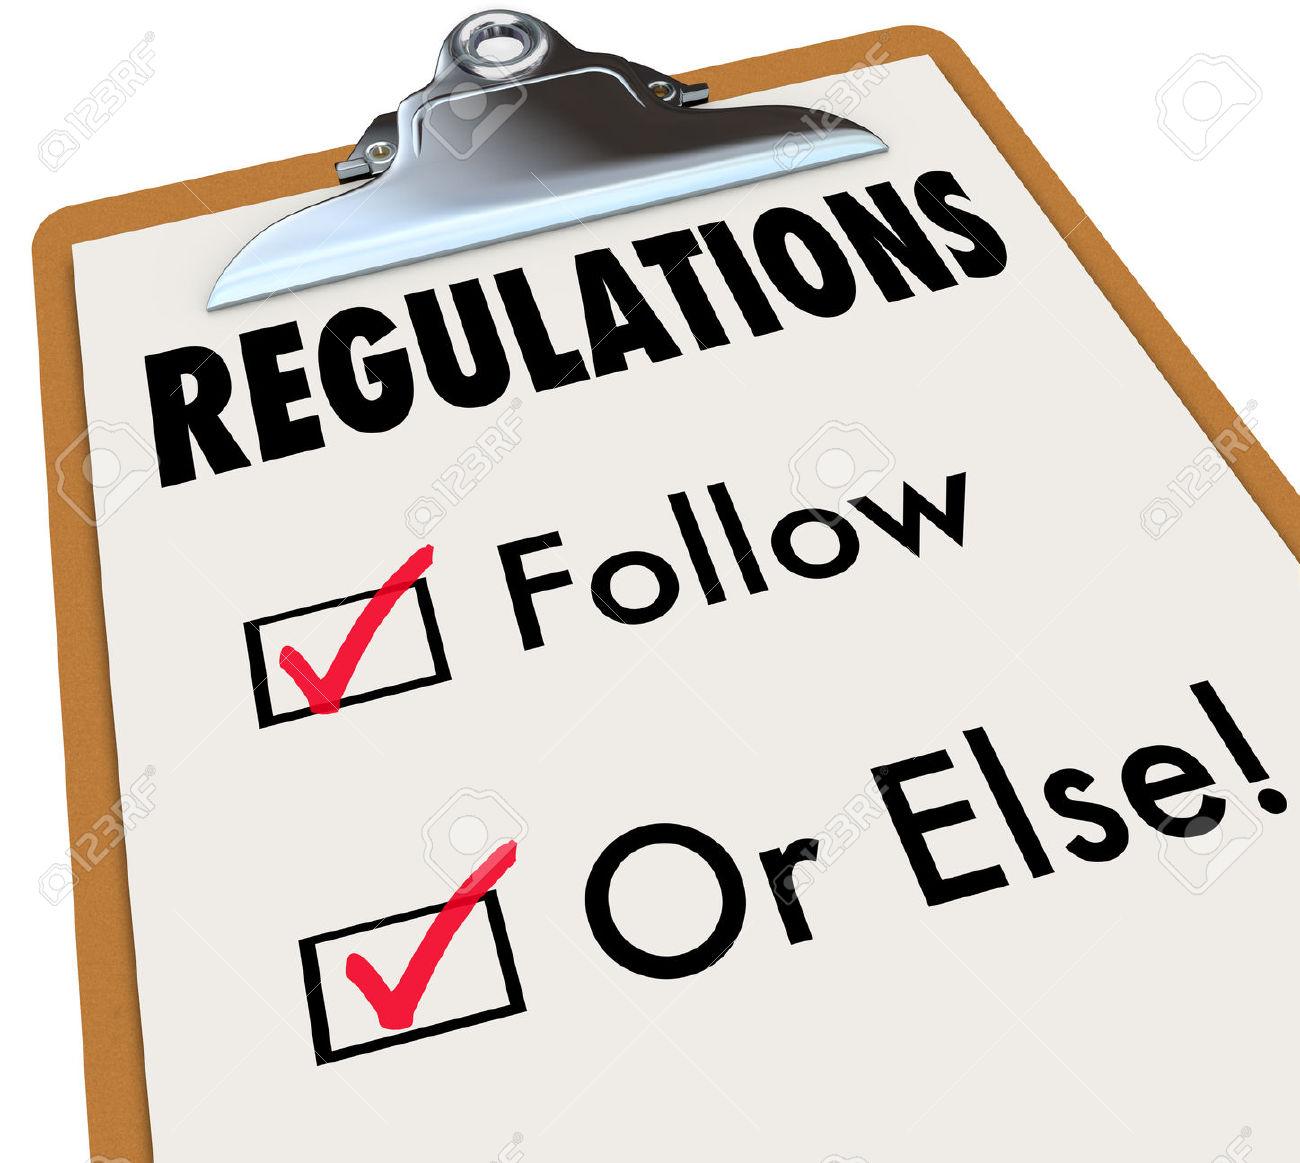 Billedresultat for regulations